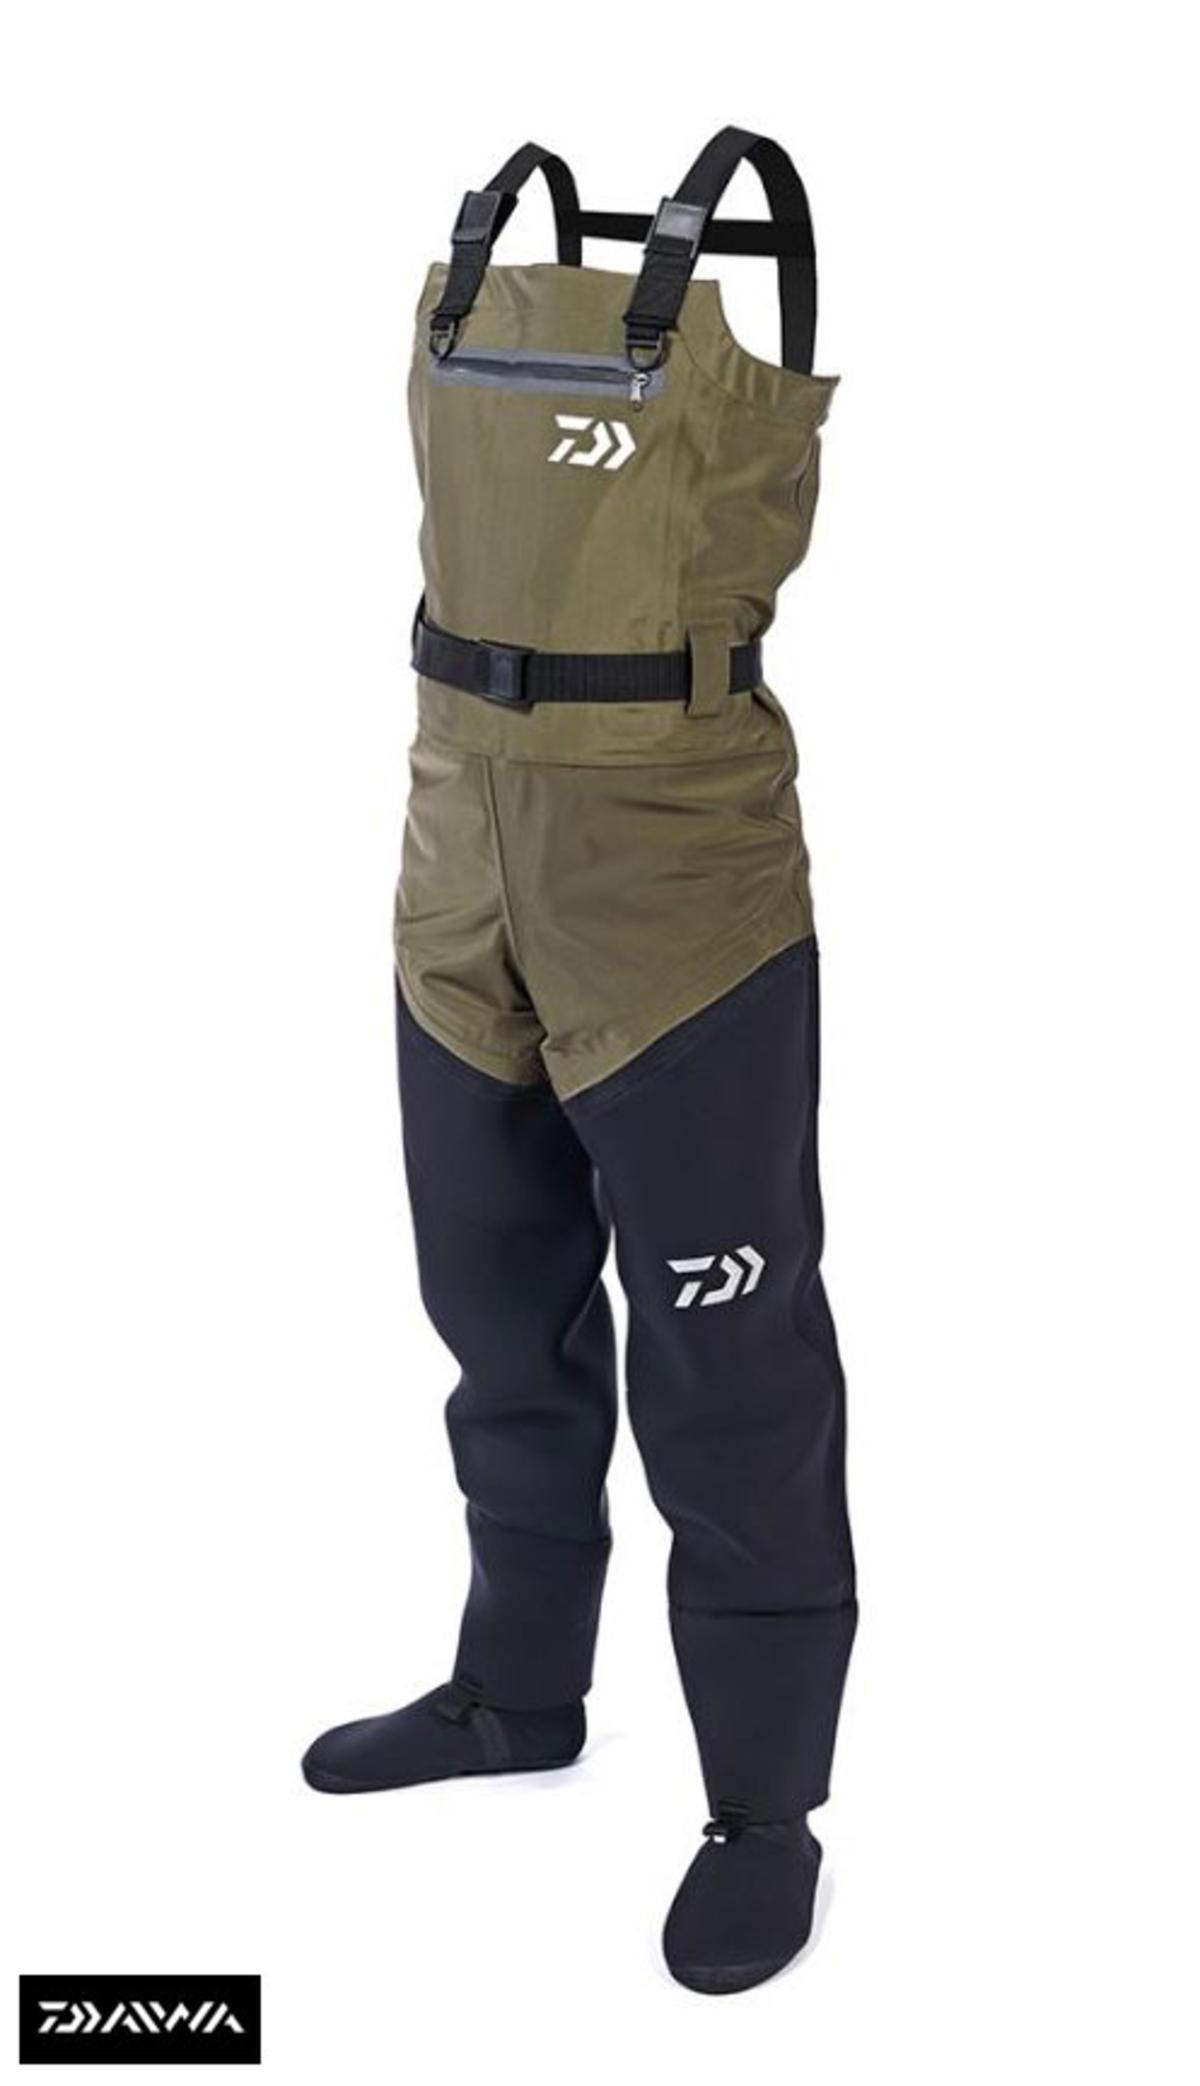 Ex Display Daiwa Hybrid 4 Stretch Breathable / Neoprene Chest Waders - Size UK8